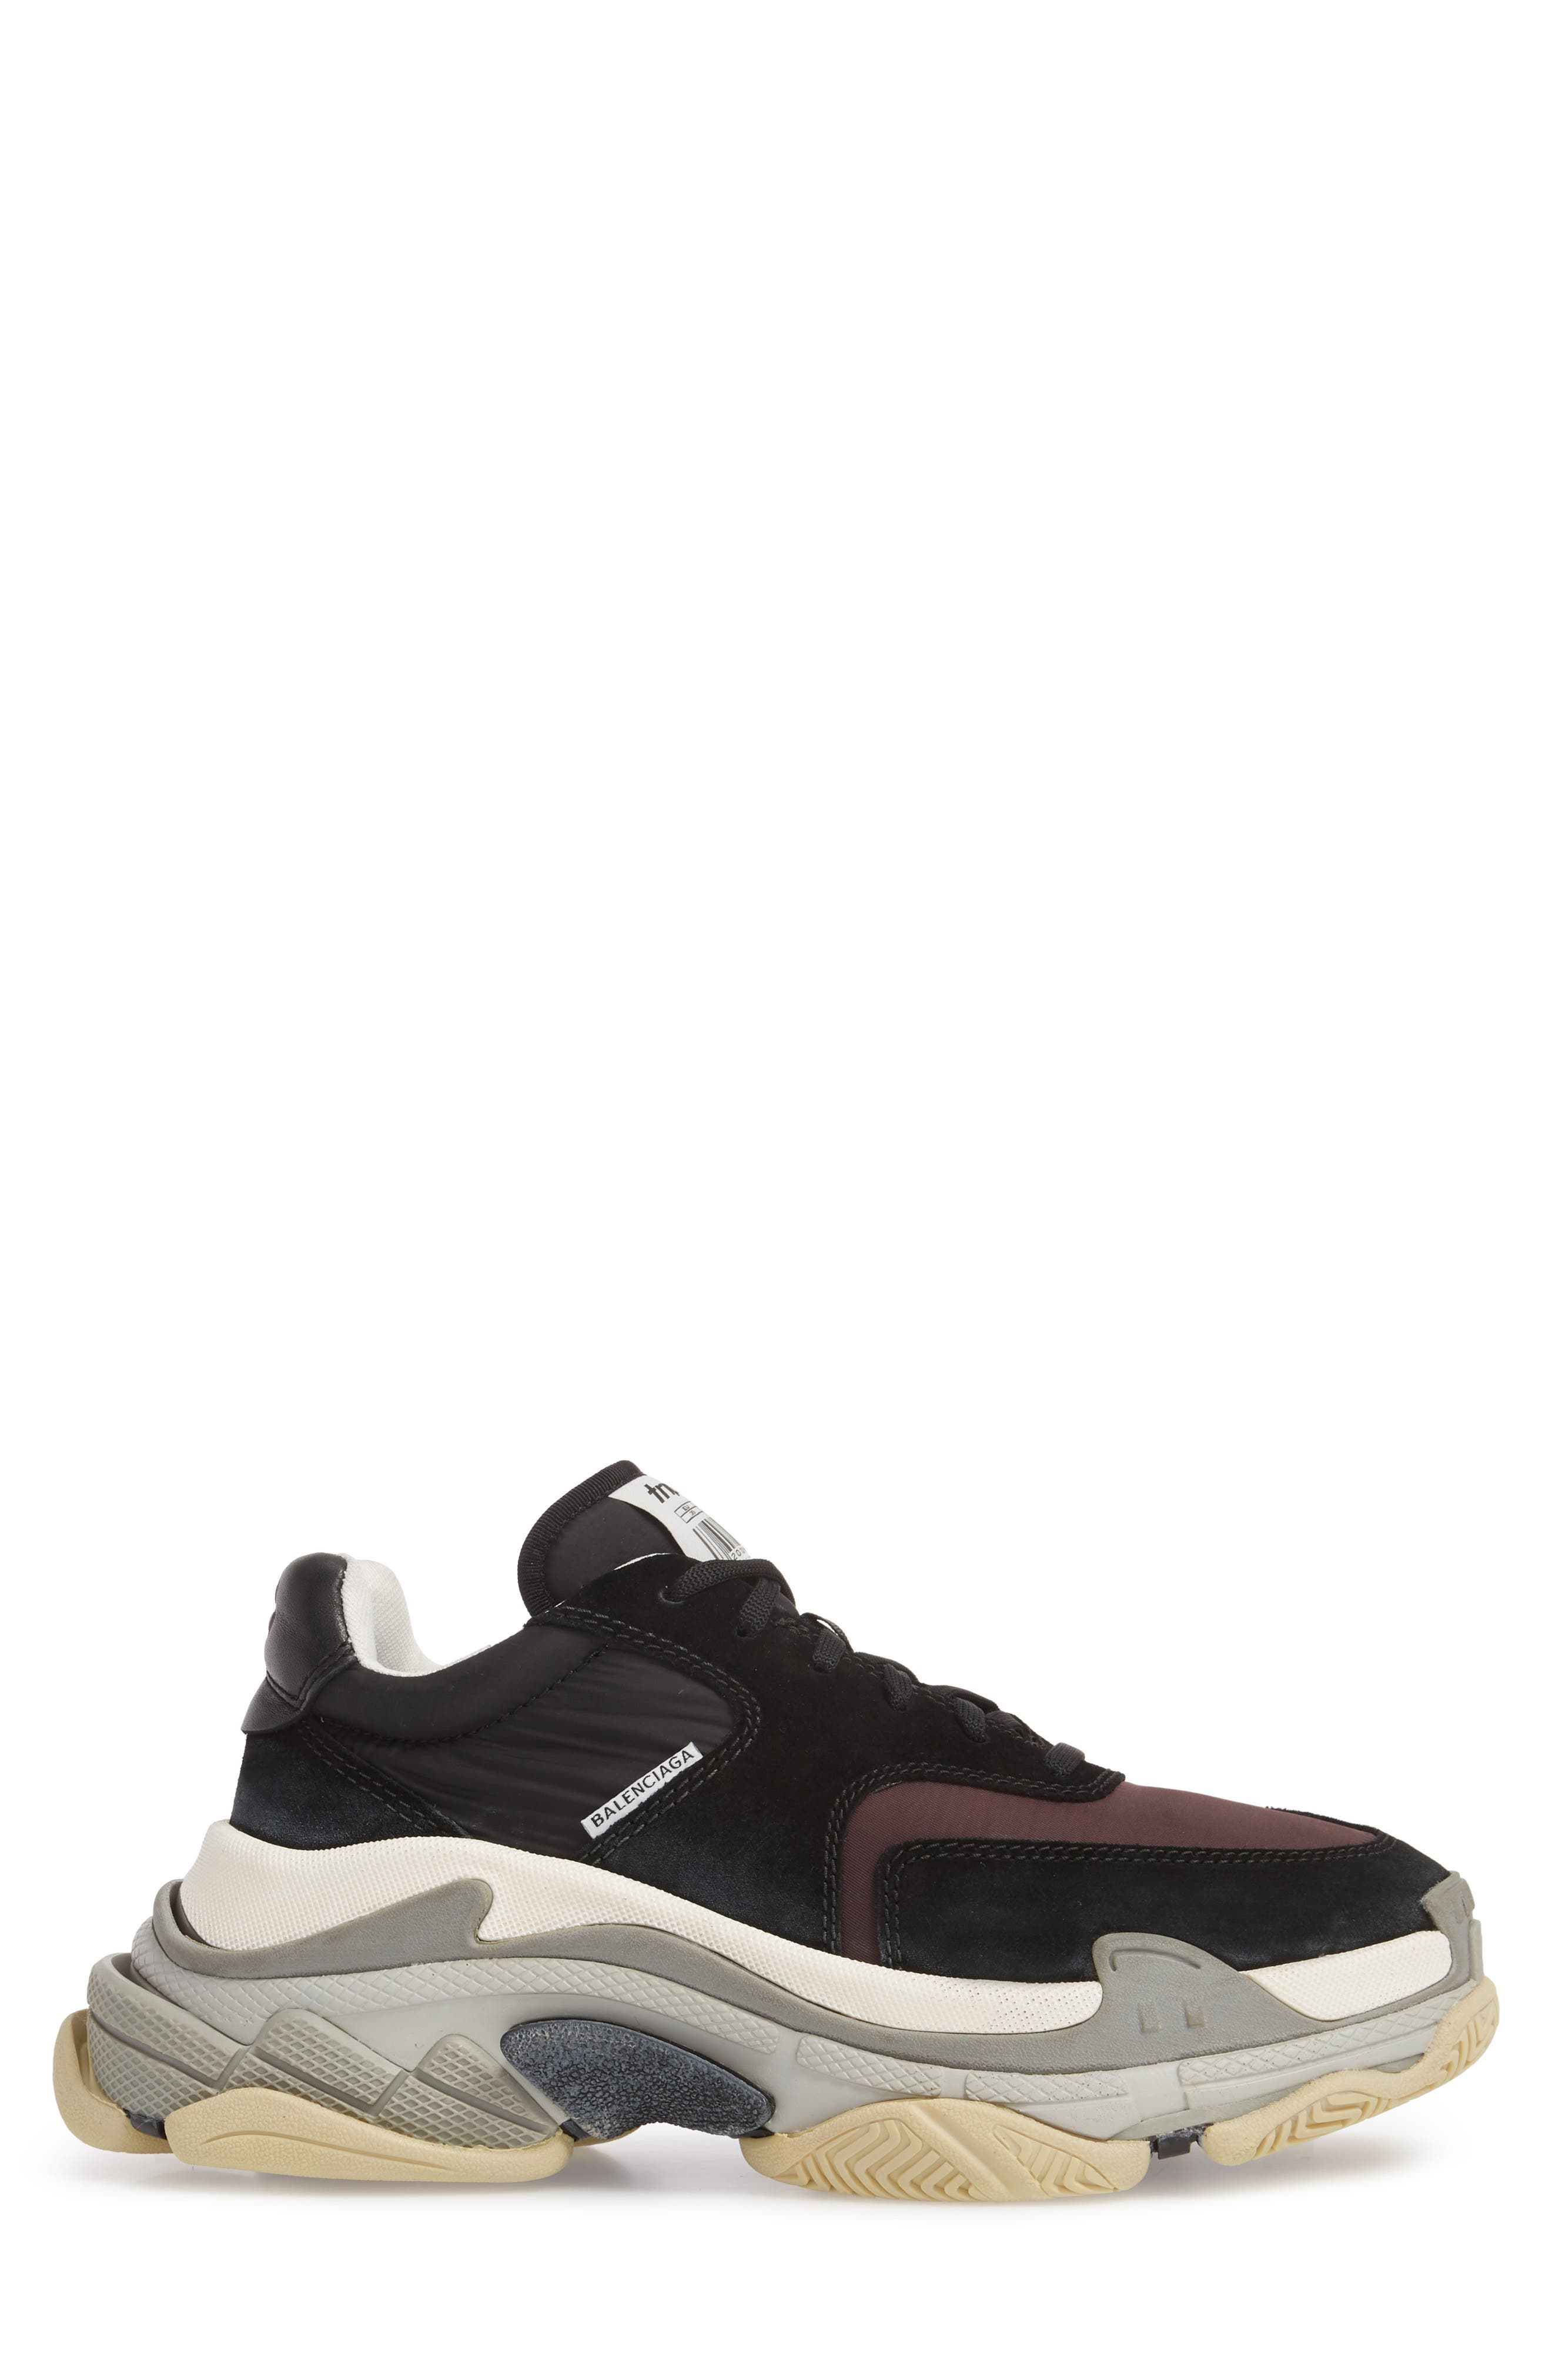 Triple S Retro Sneaker,                             Alternate thumbnail 3, color,                             Black/ Bordeaux